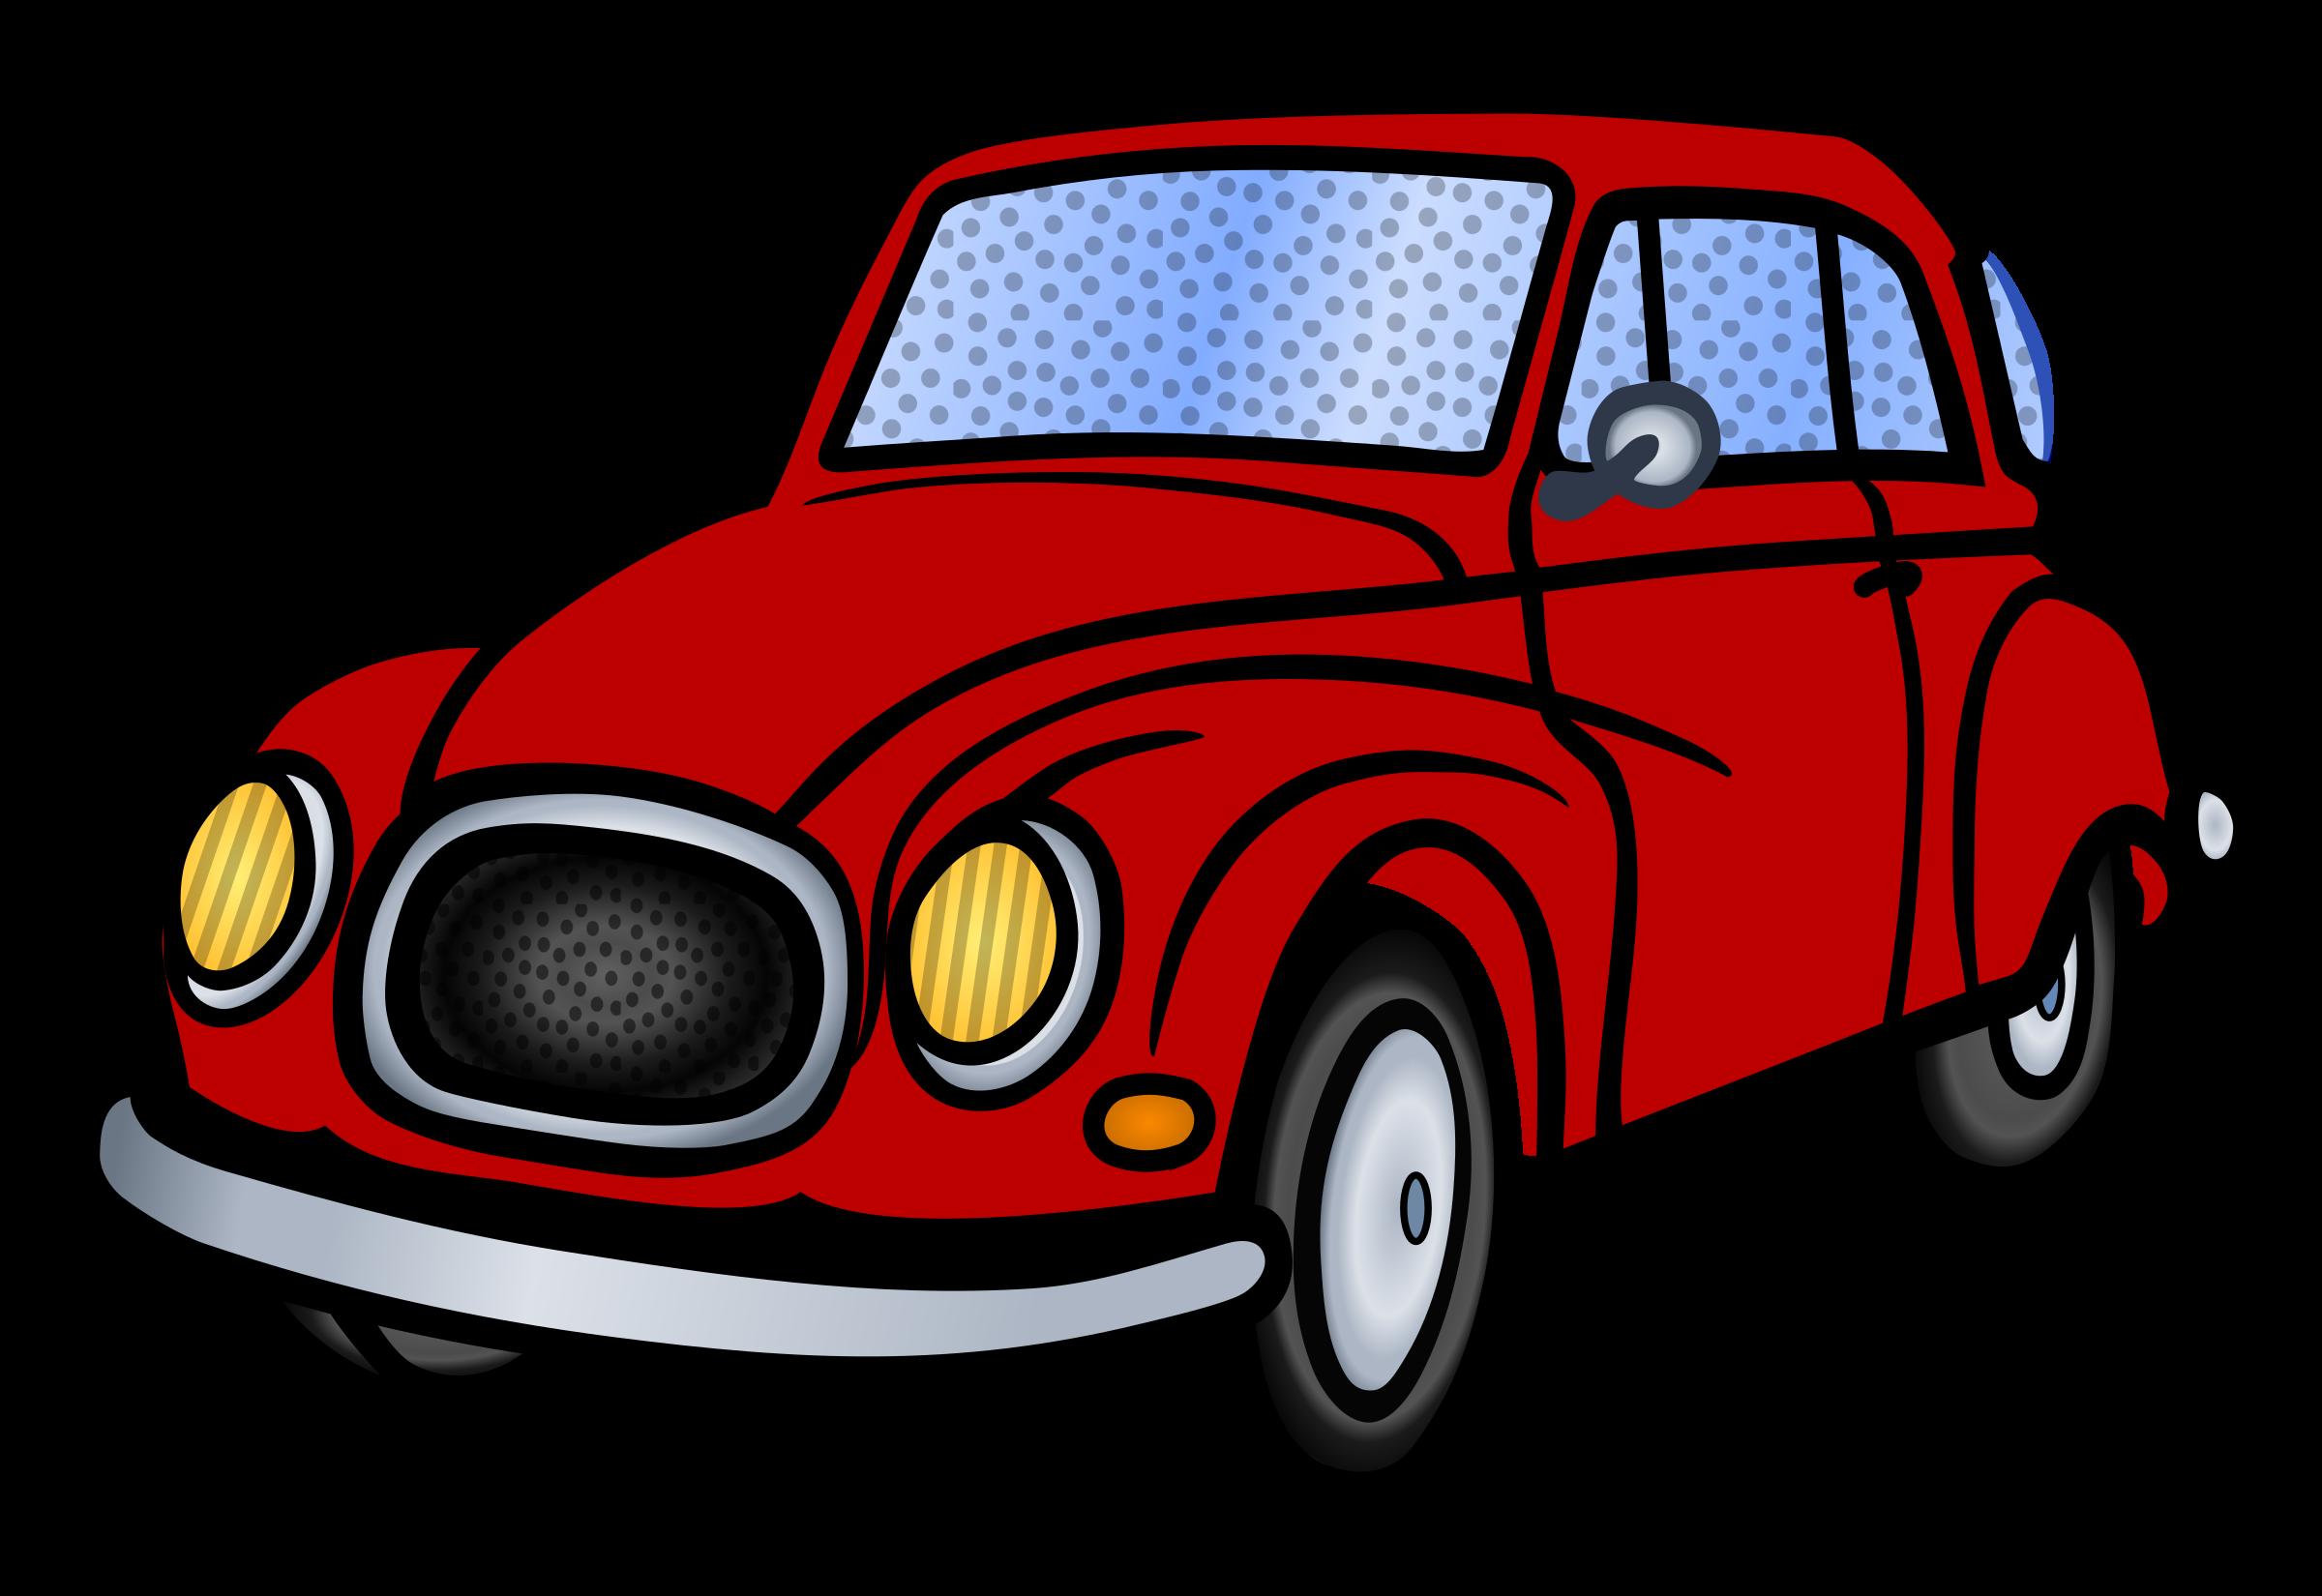 Clipart cars pdf. Car coloured big image